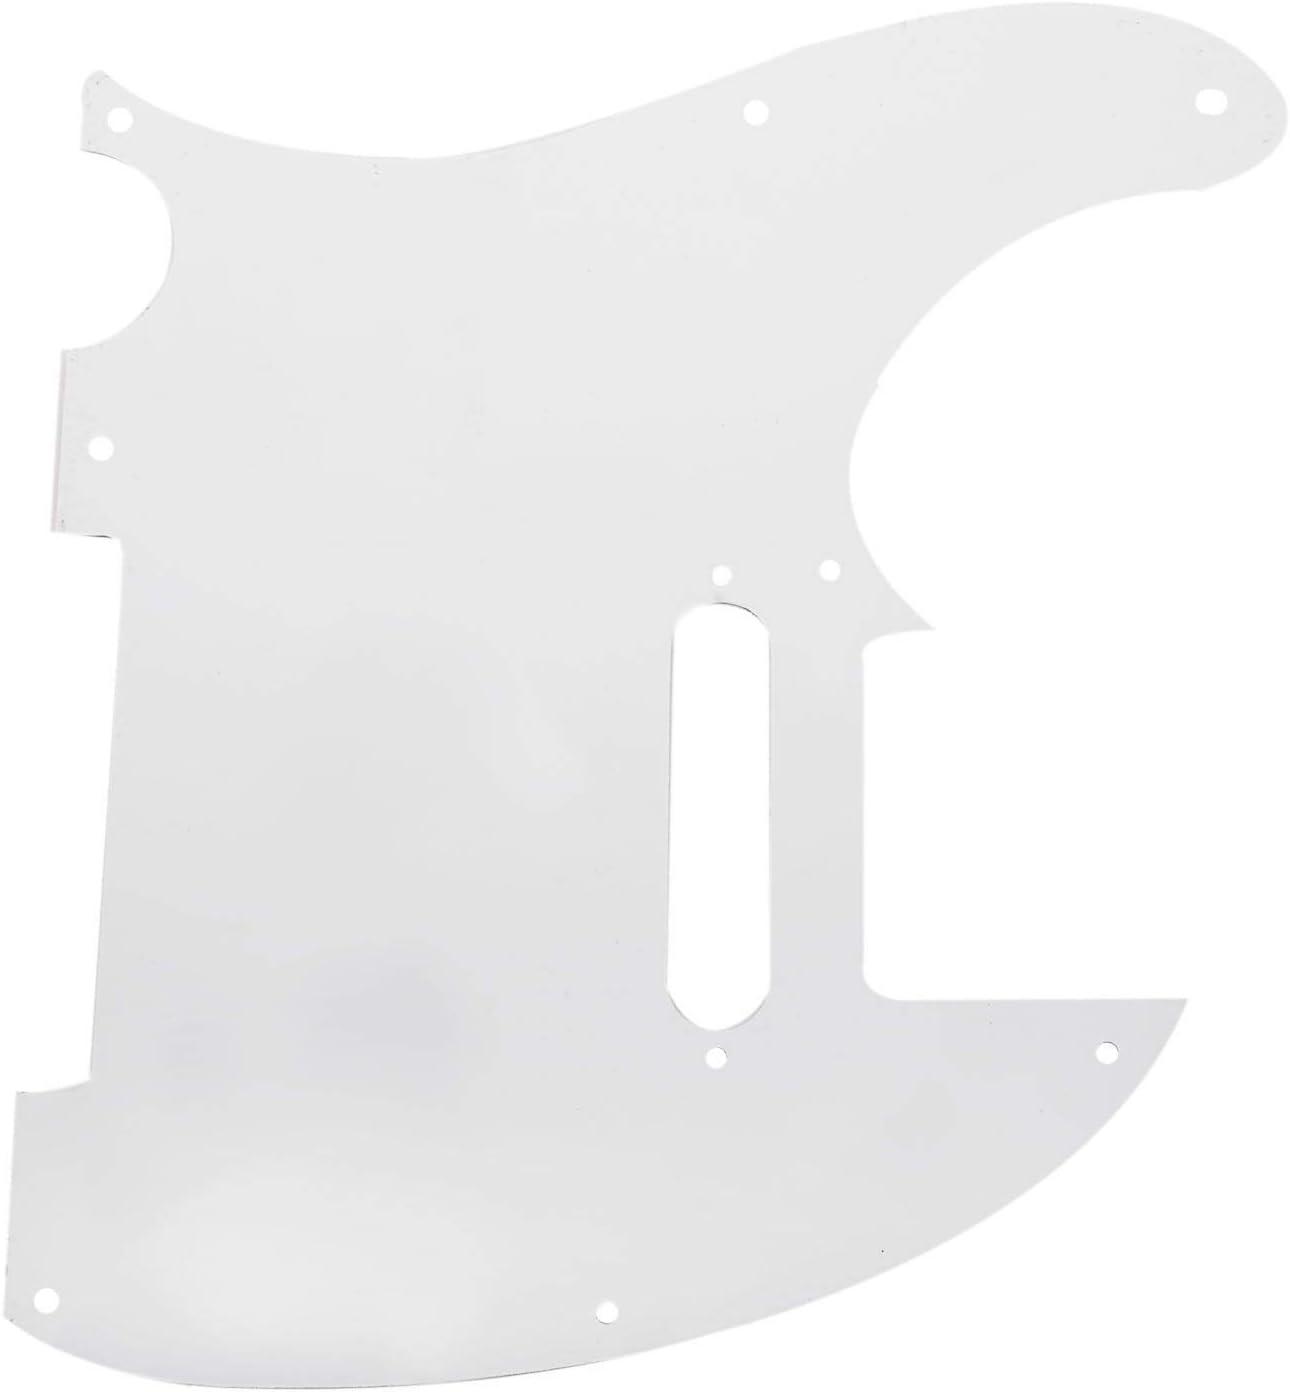 CUHAWUDBA Blanco 3 Ply Caja de Resonancia de Guitarra Electrica Para Tele Estilo Guitarra Electrica